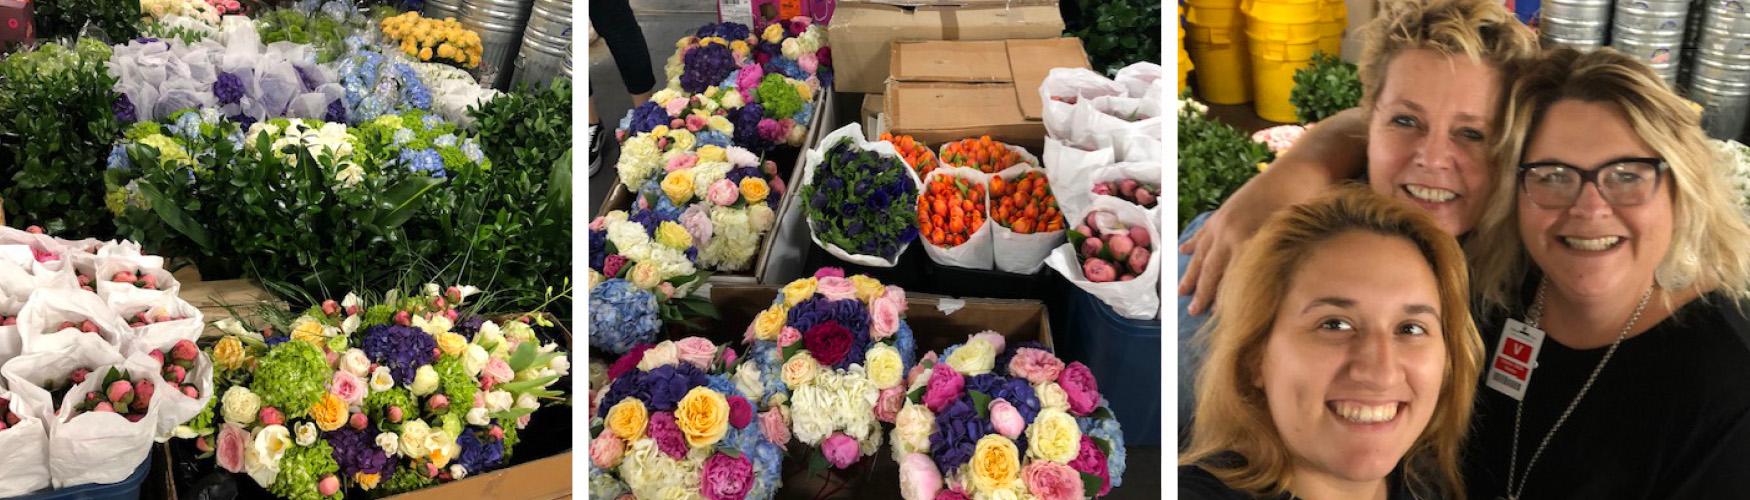 Cruise-Ship-Flowers-Oprah-Holland-America-4.jpg